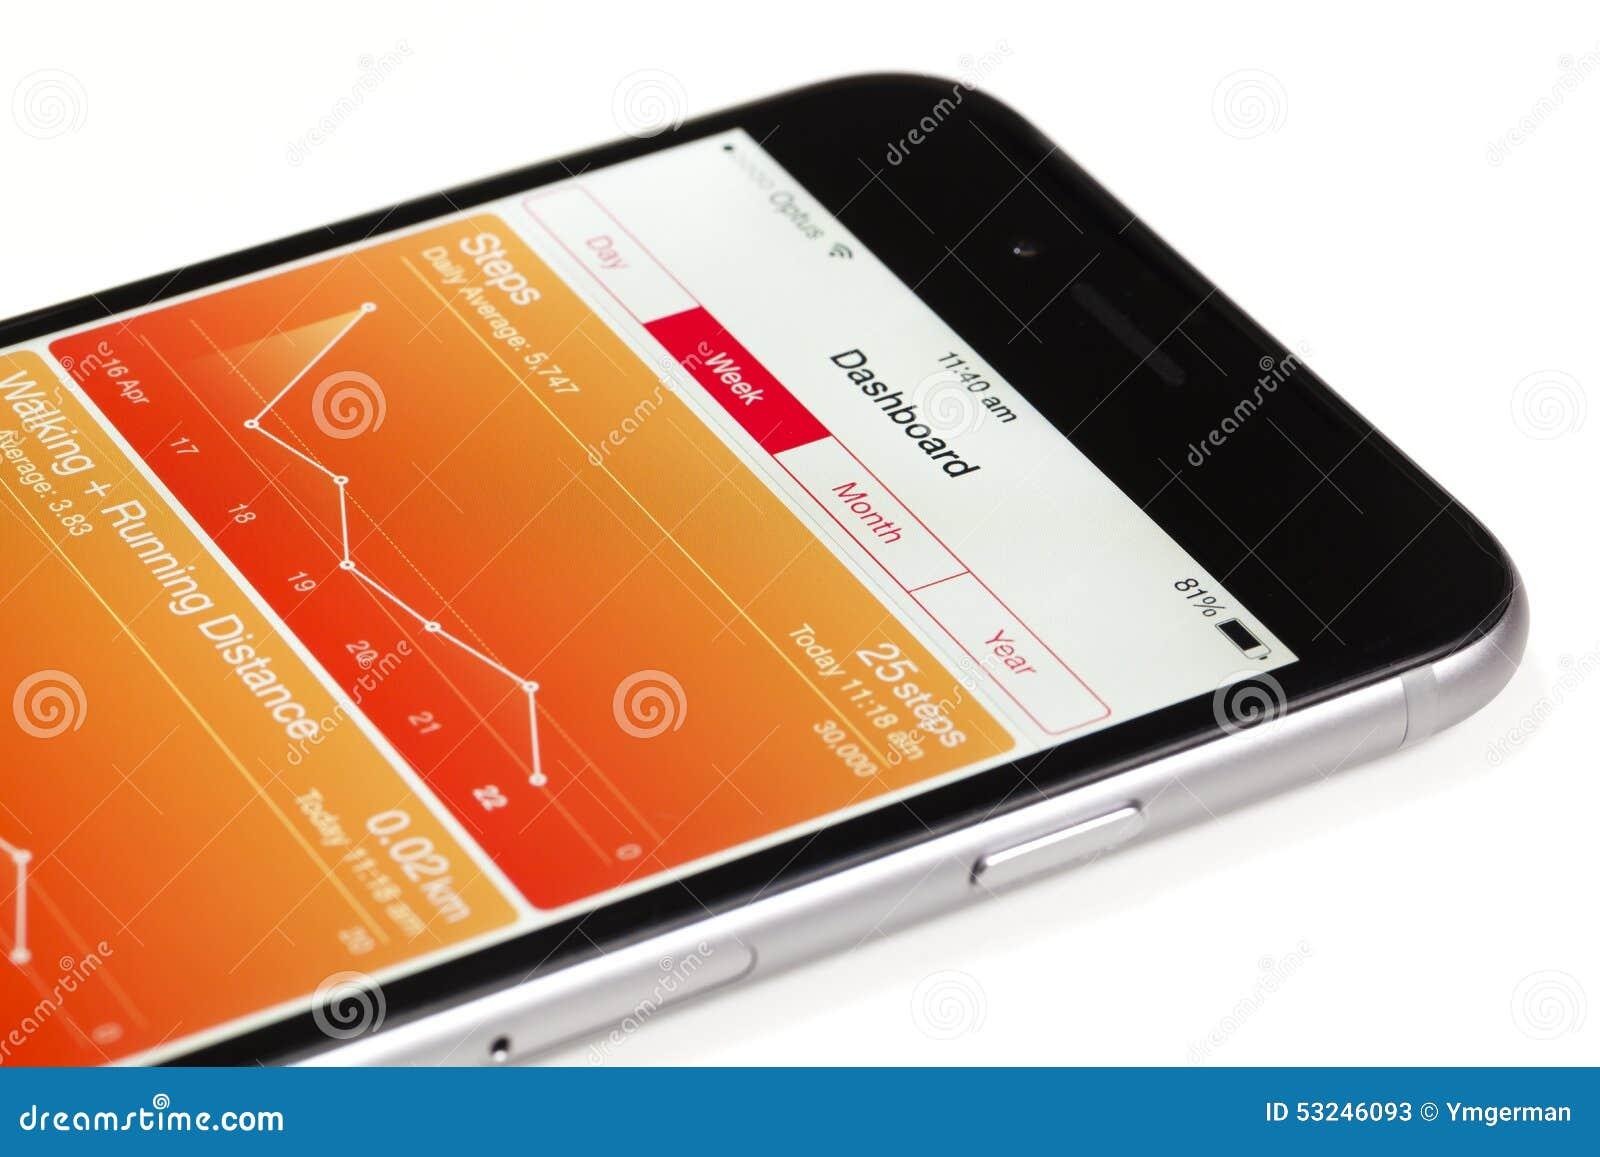 Date app in Melbourne